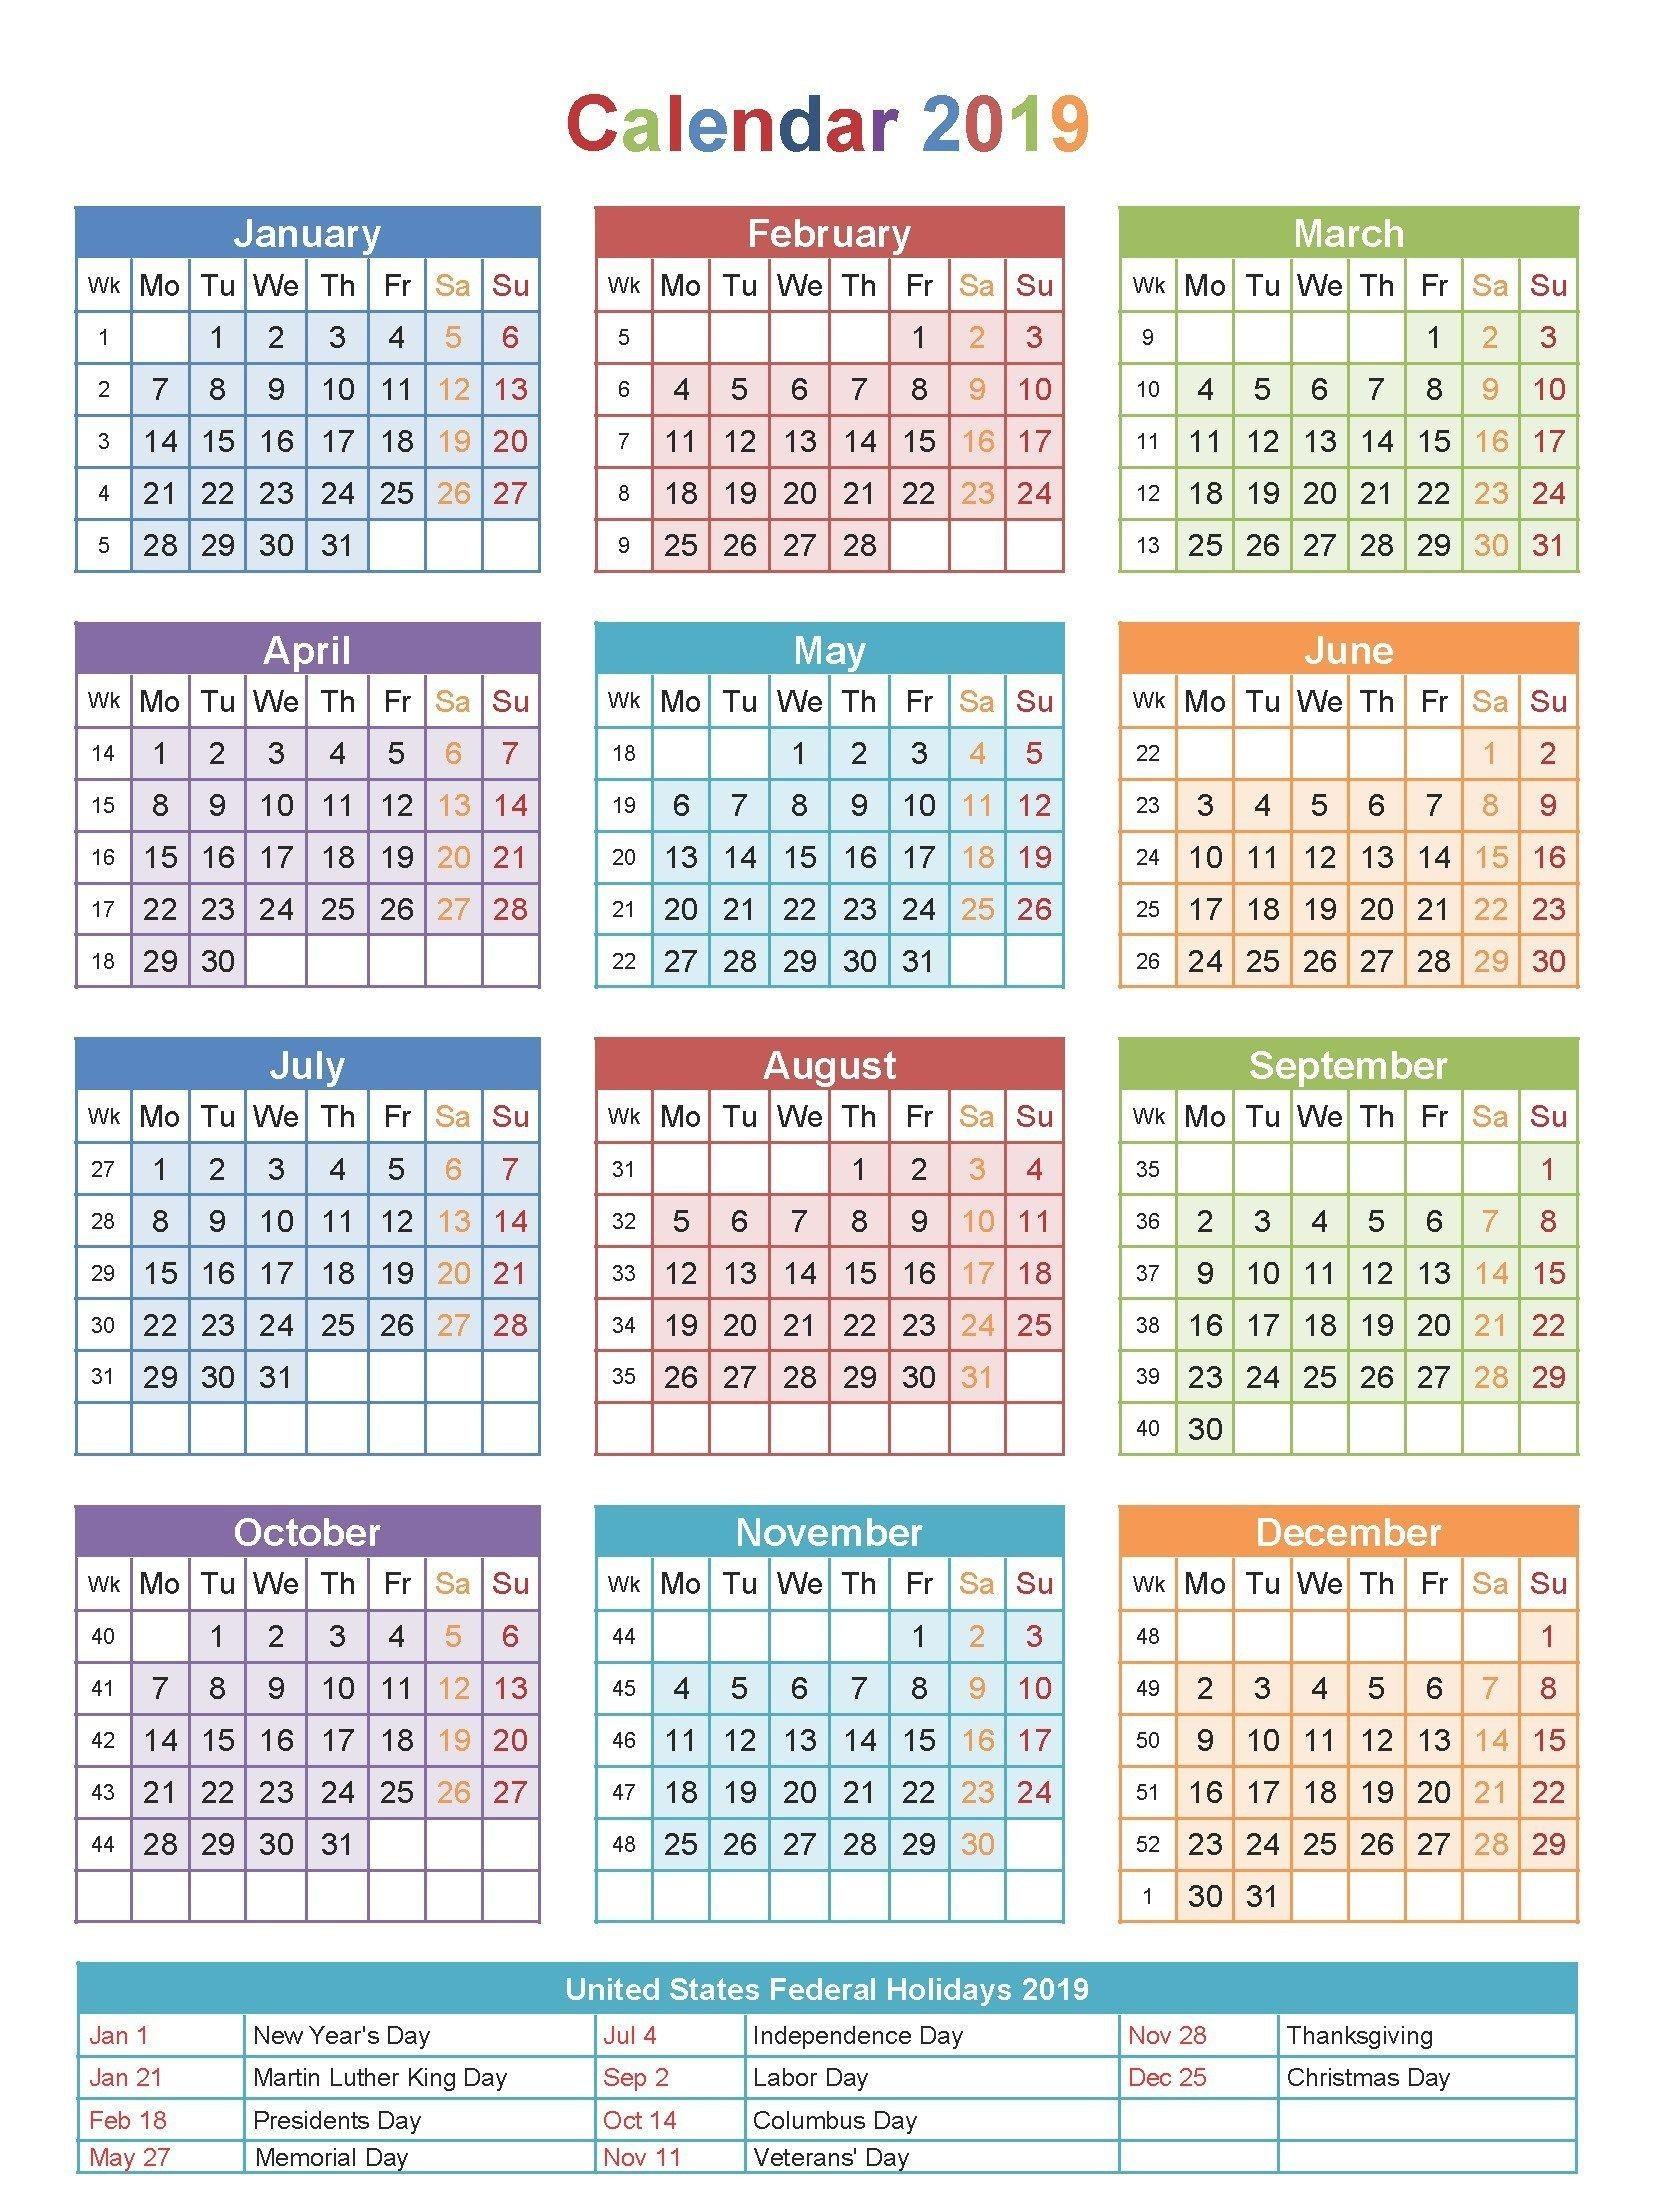 Free Editable Usa 2019 Calendar Pdf Excel Word Templates